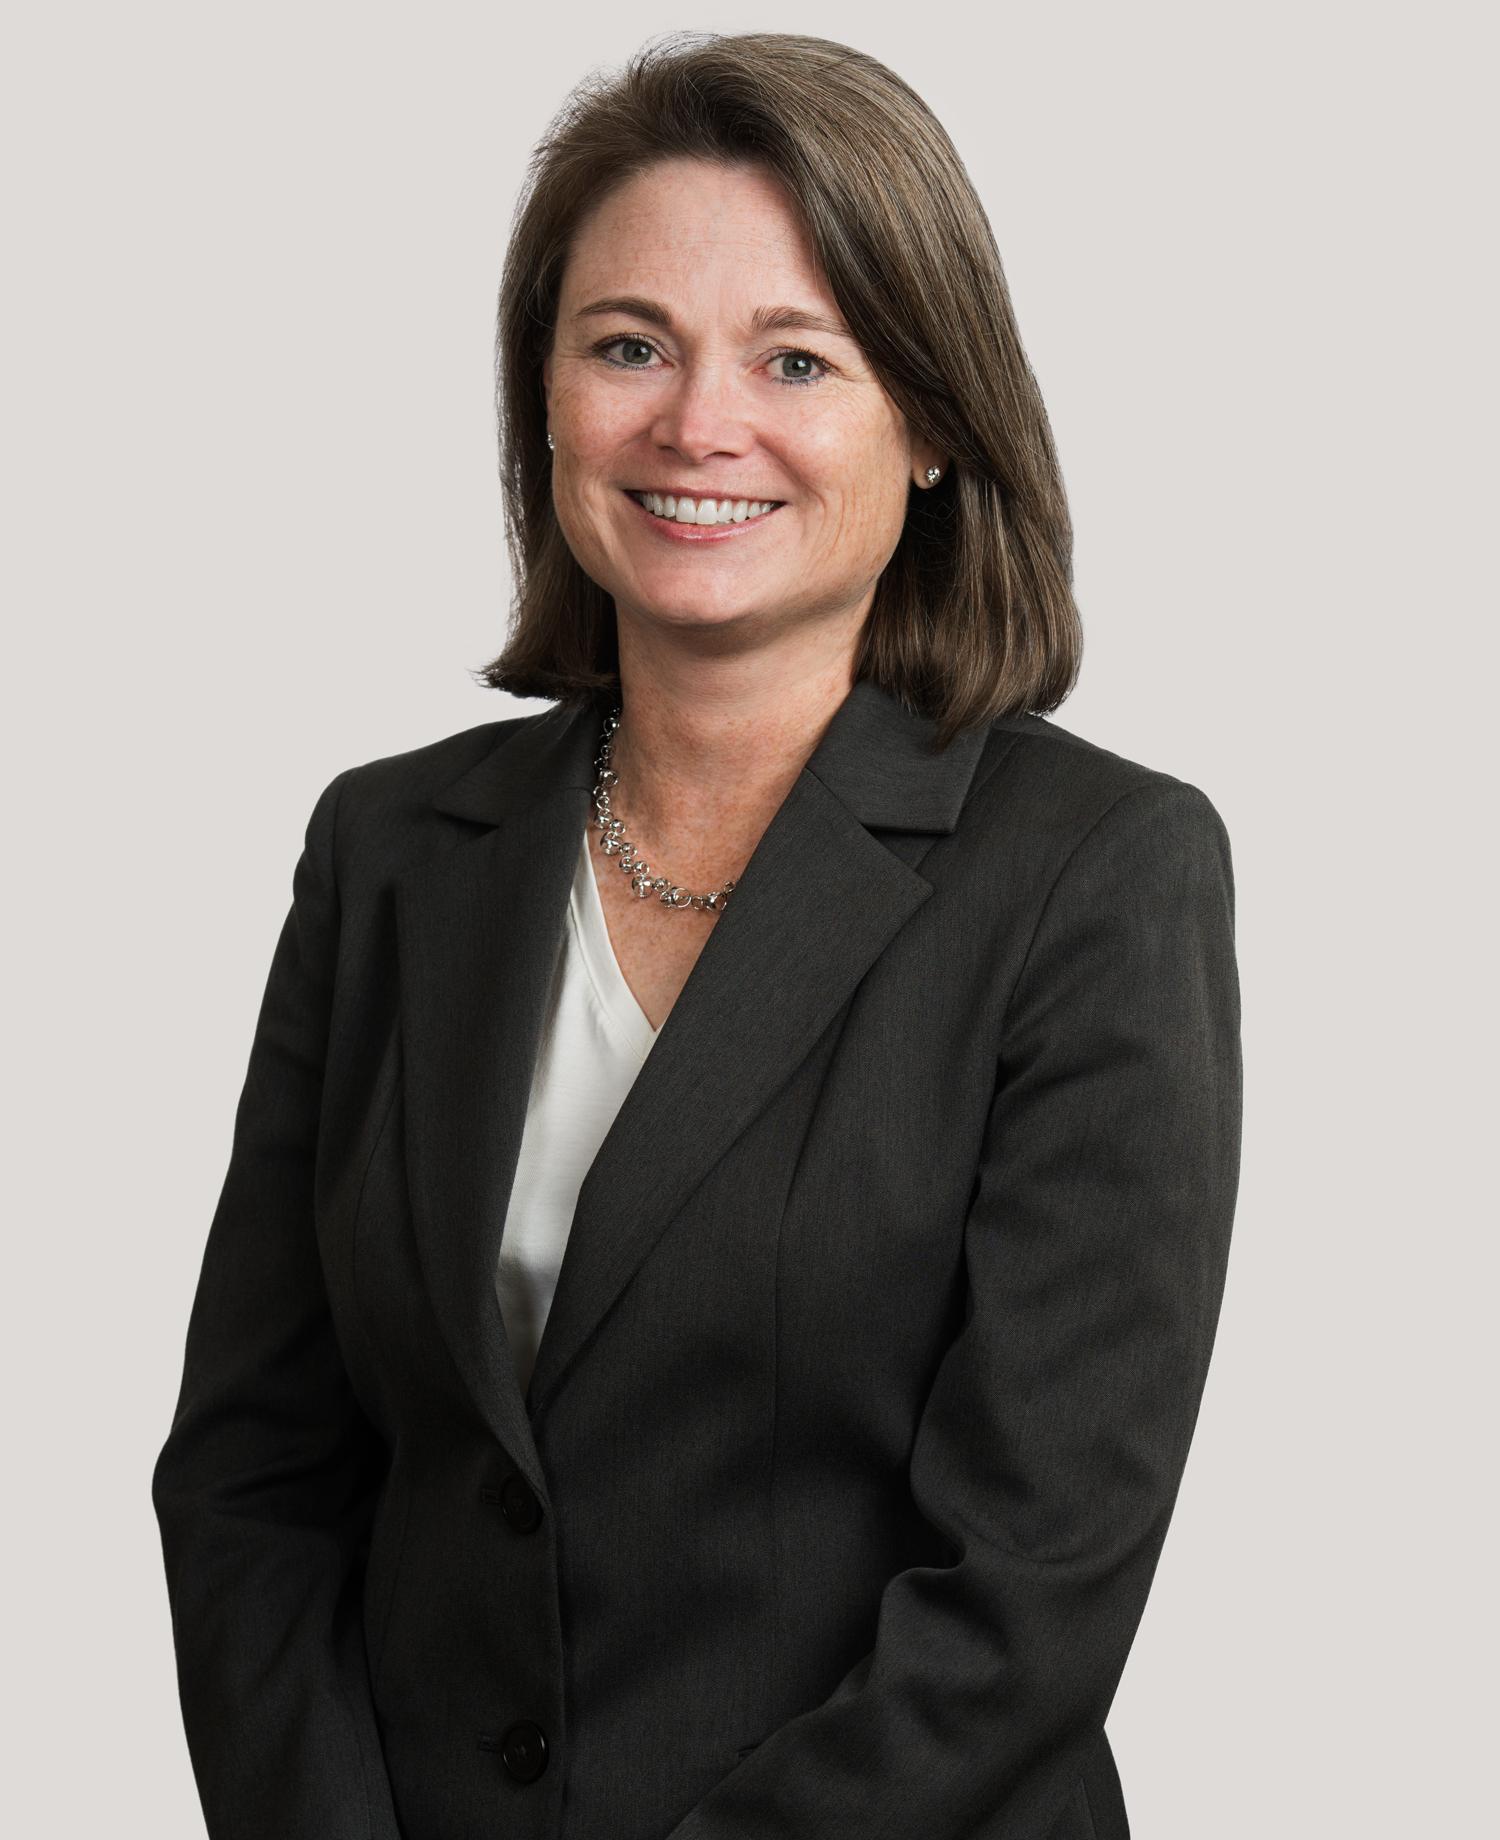 Elizabeth E. McGinn